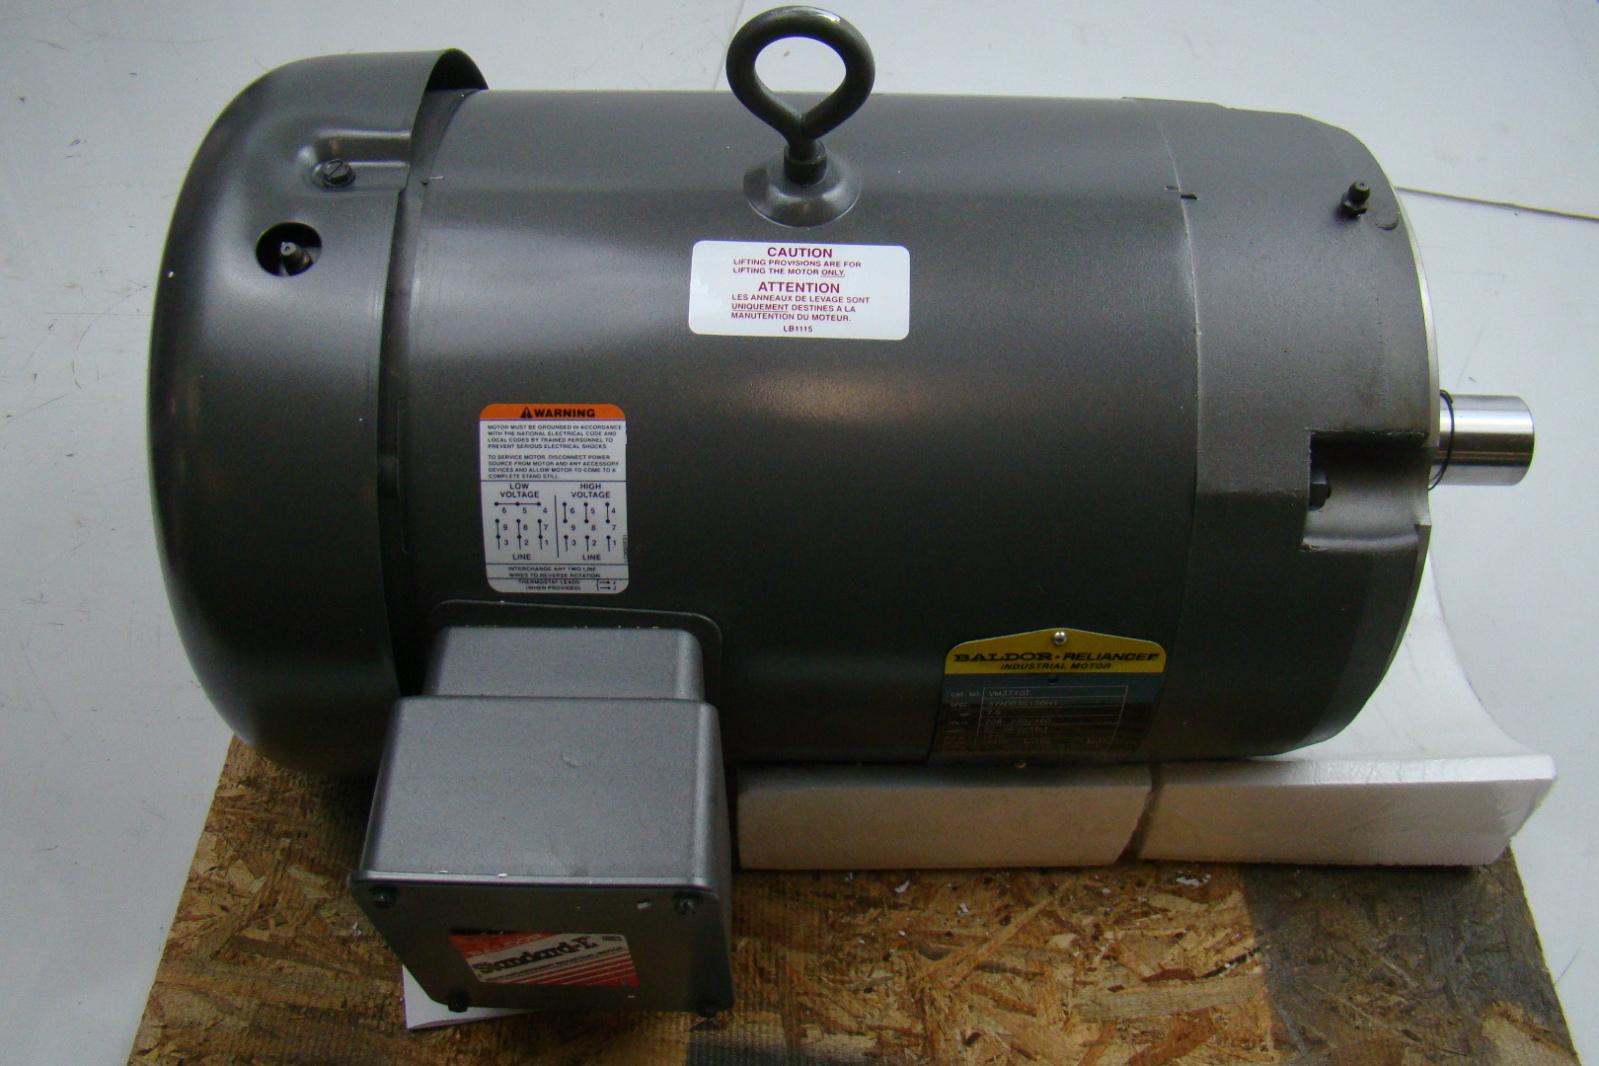 Baldor reliance 7 5hp electric motor 230 460v vm3710t ebay for Motor baldor 20 hp